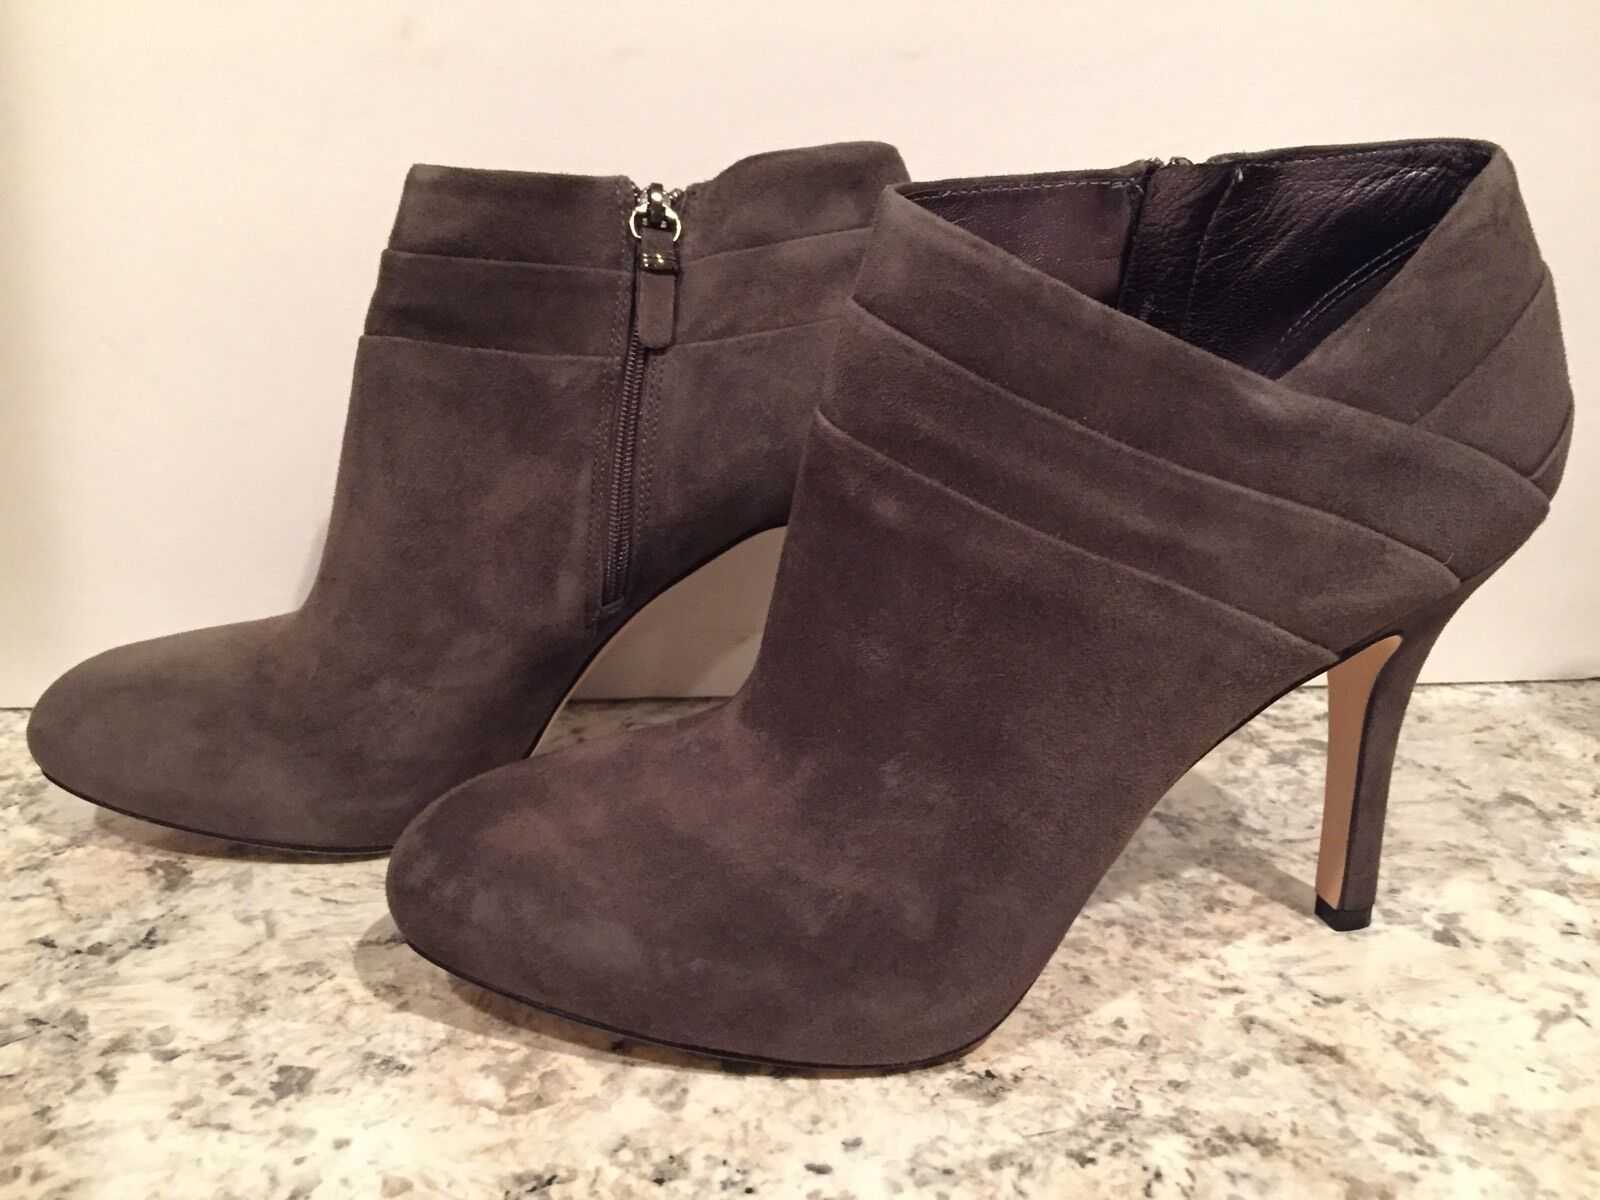 669e43550f2e ... Via Spiga Jovi Stylish Ankle Boots Suede Heel Zip Zip Zip Gray 10 M   225 New ...